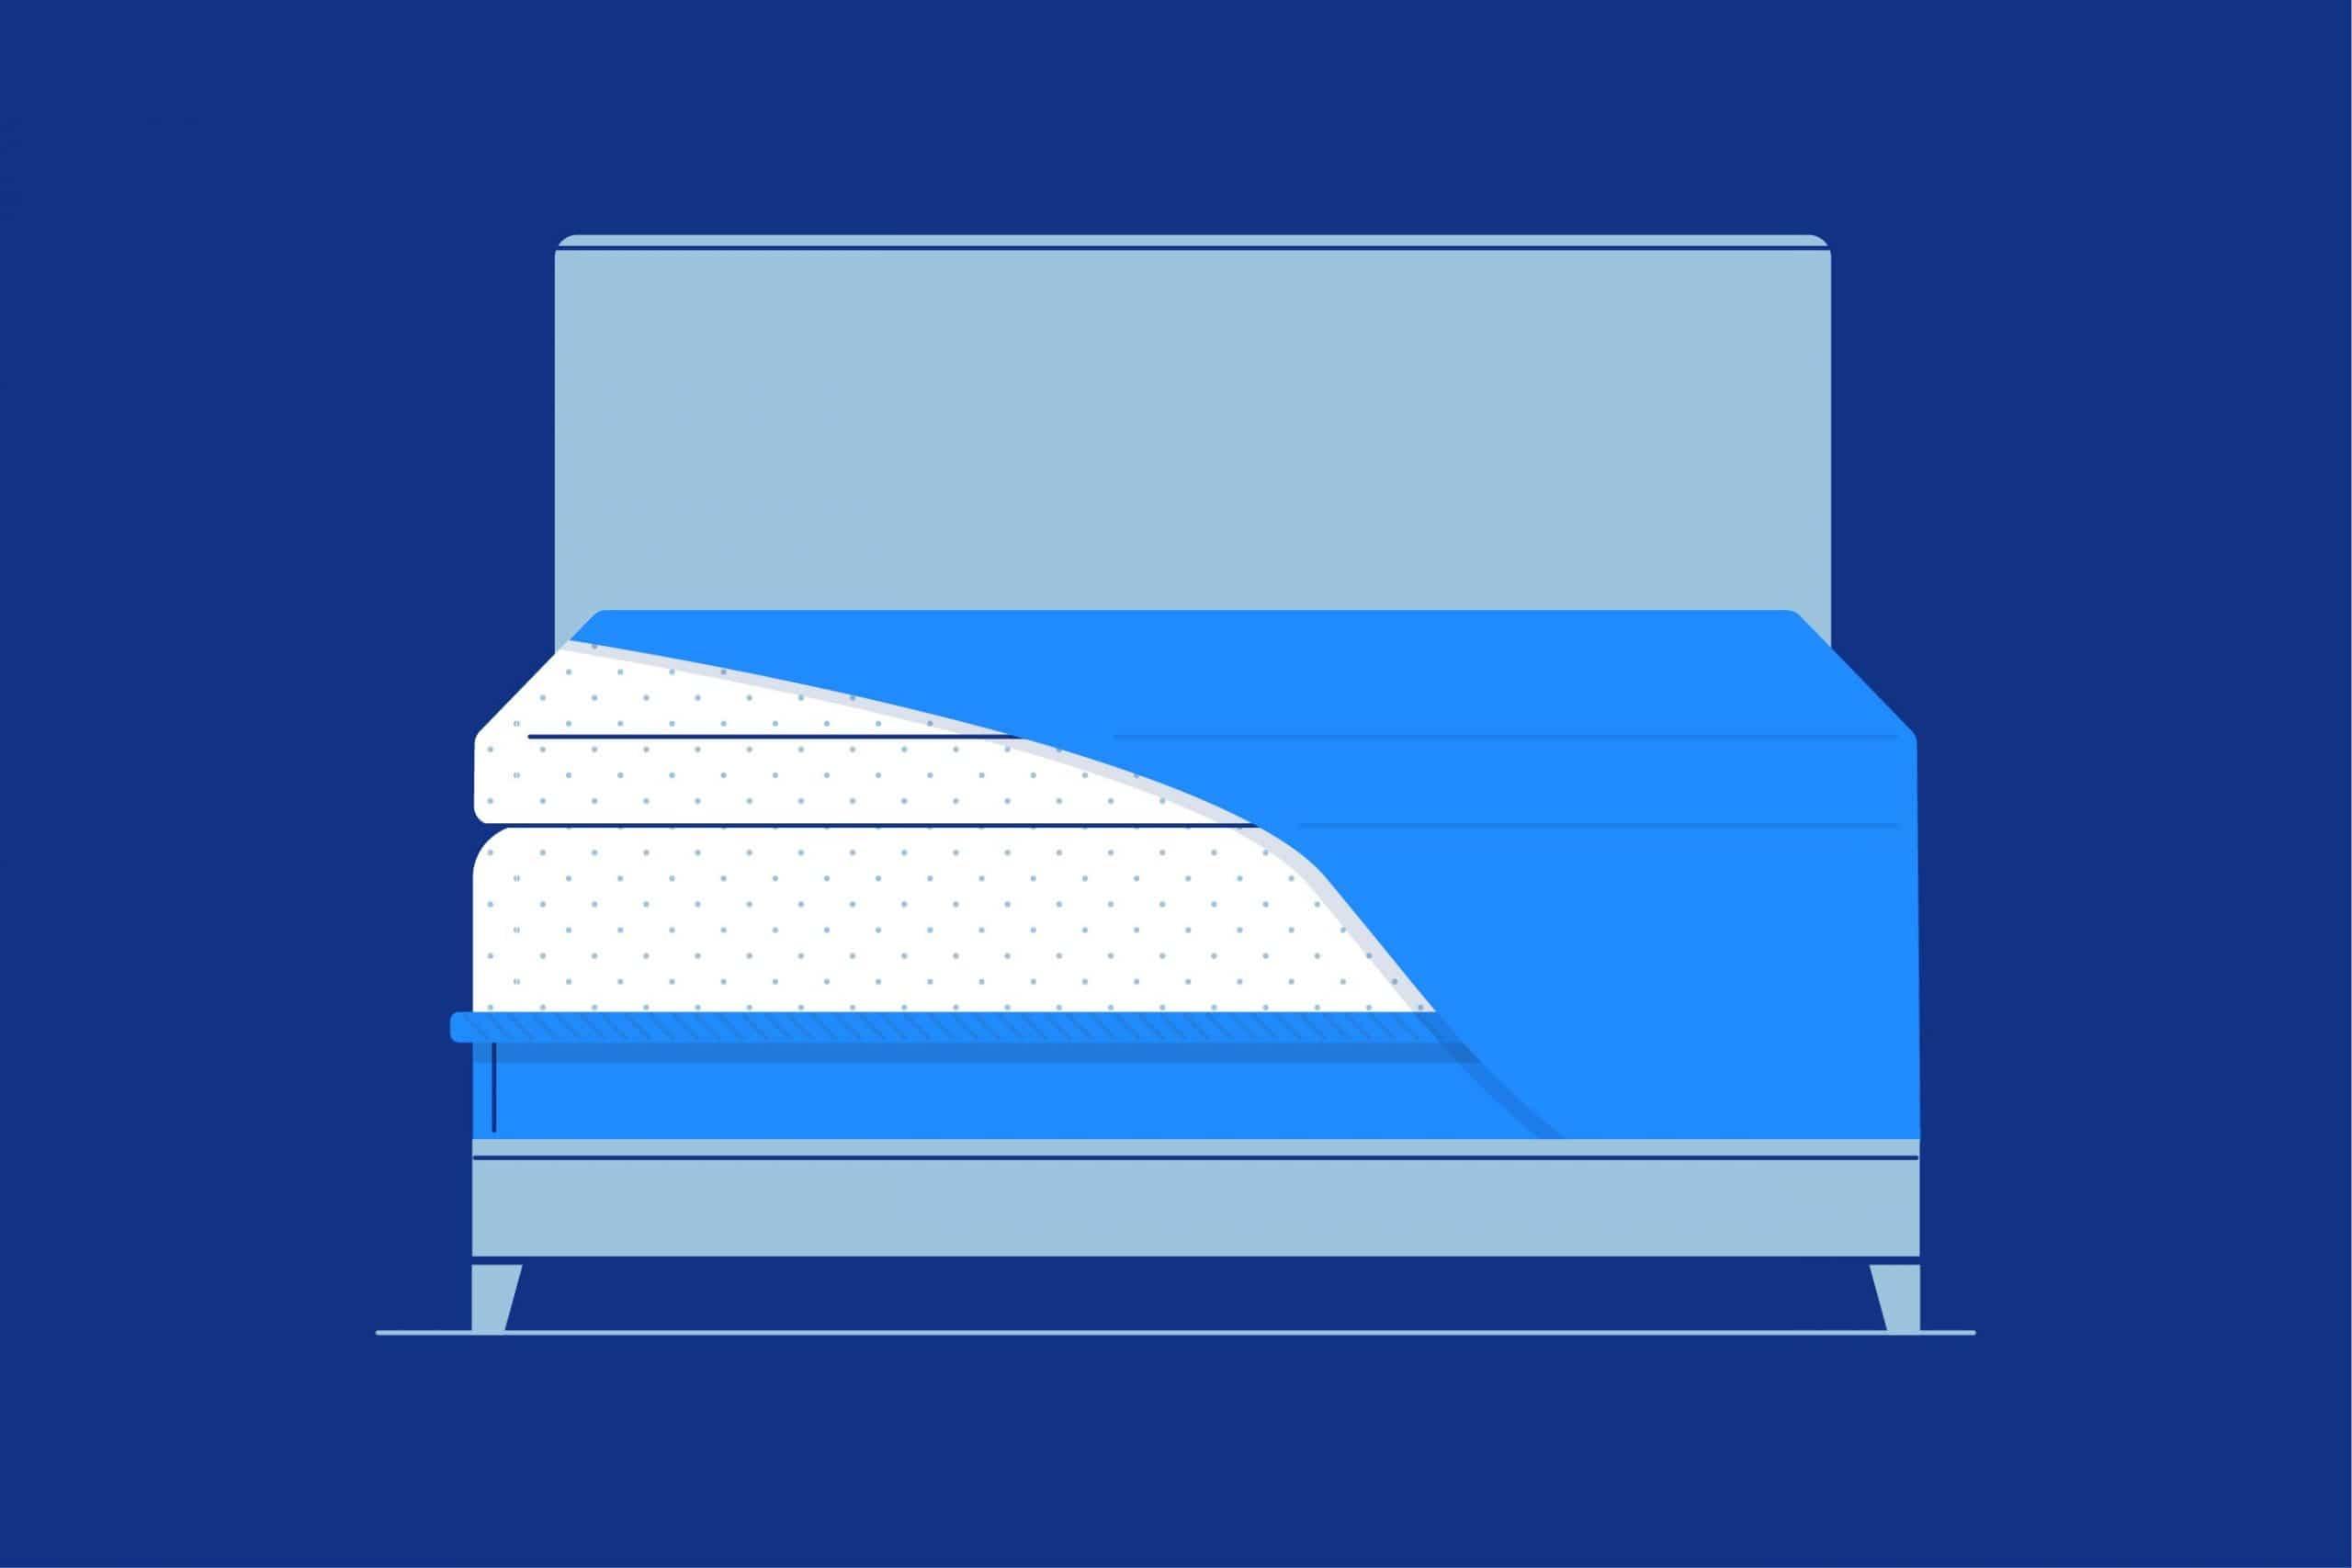 How To Keep a Mattress Topper From Sliding   Amerisleep